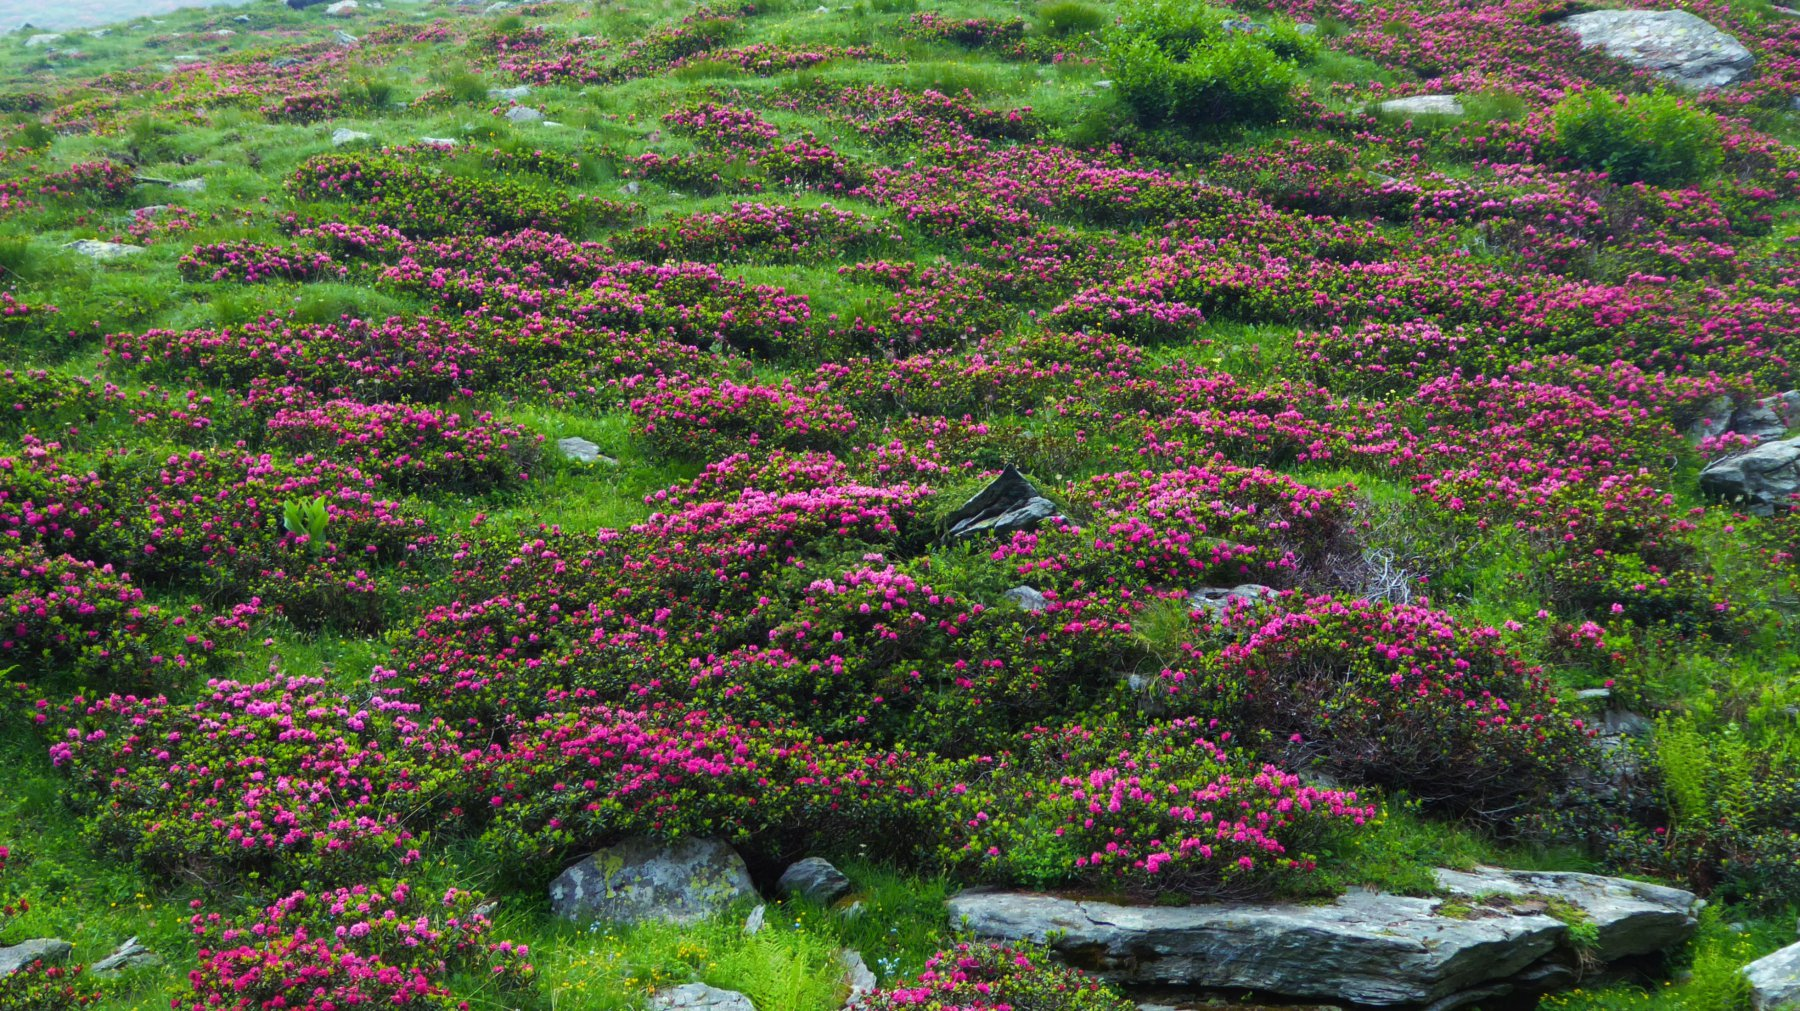 Bellissima fioritura di rododendri